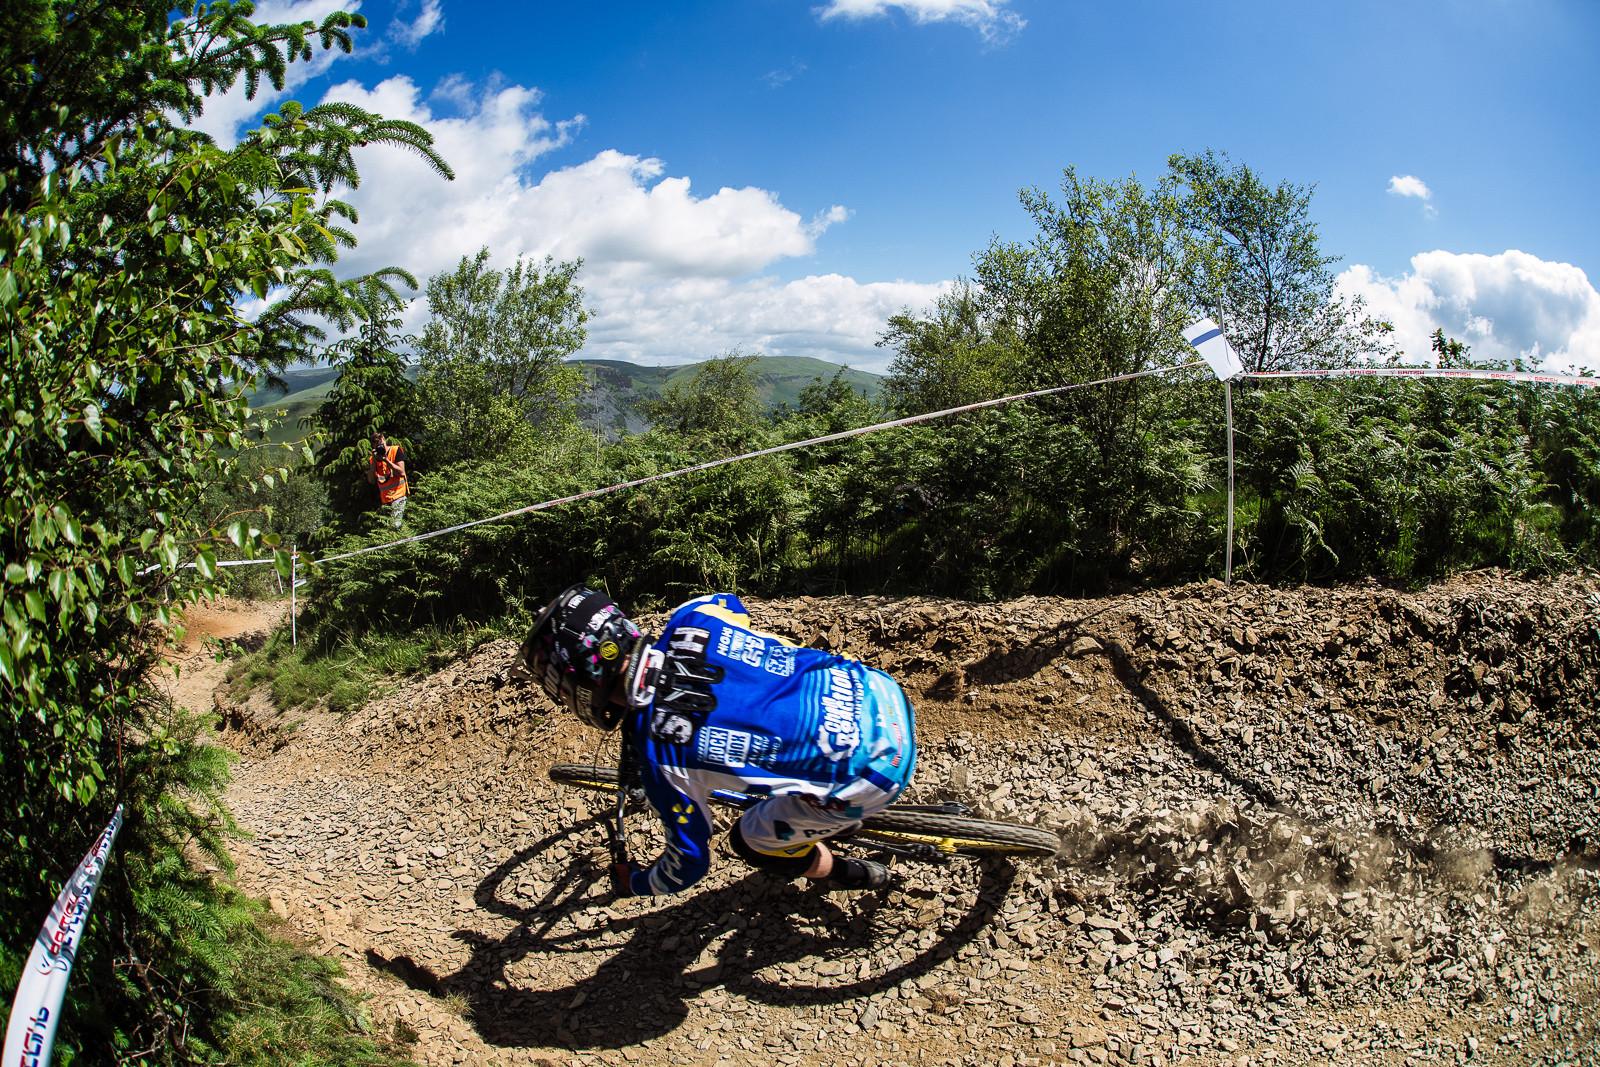 Joe Smith, Winner of the 2015 British DH Series, Bala - RACE REPORT - 2015 British Downhill Series Bala - Mountain Biking Pictures - Vital MTB